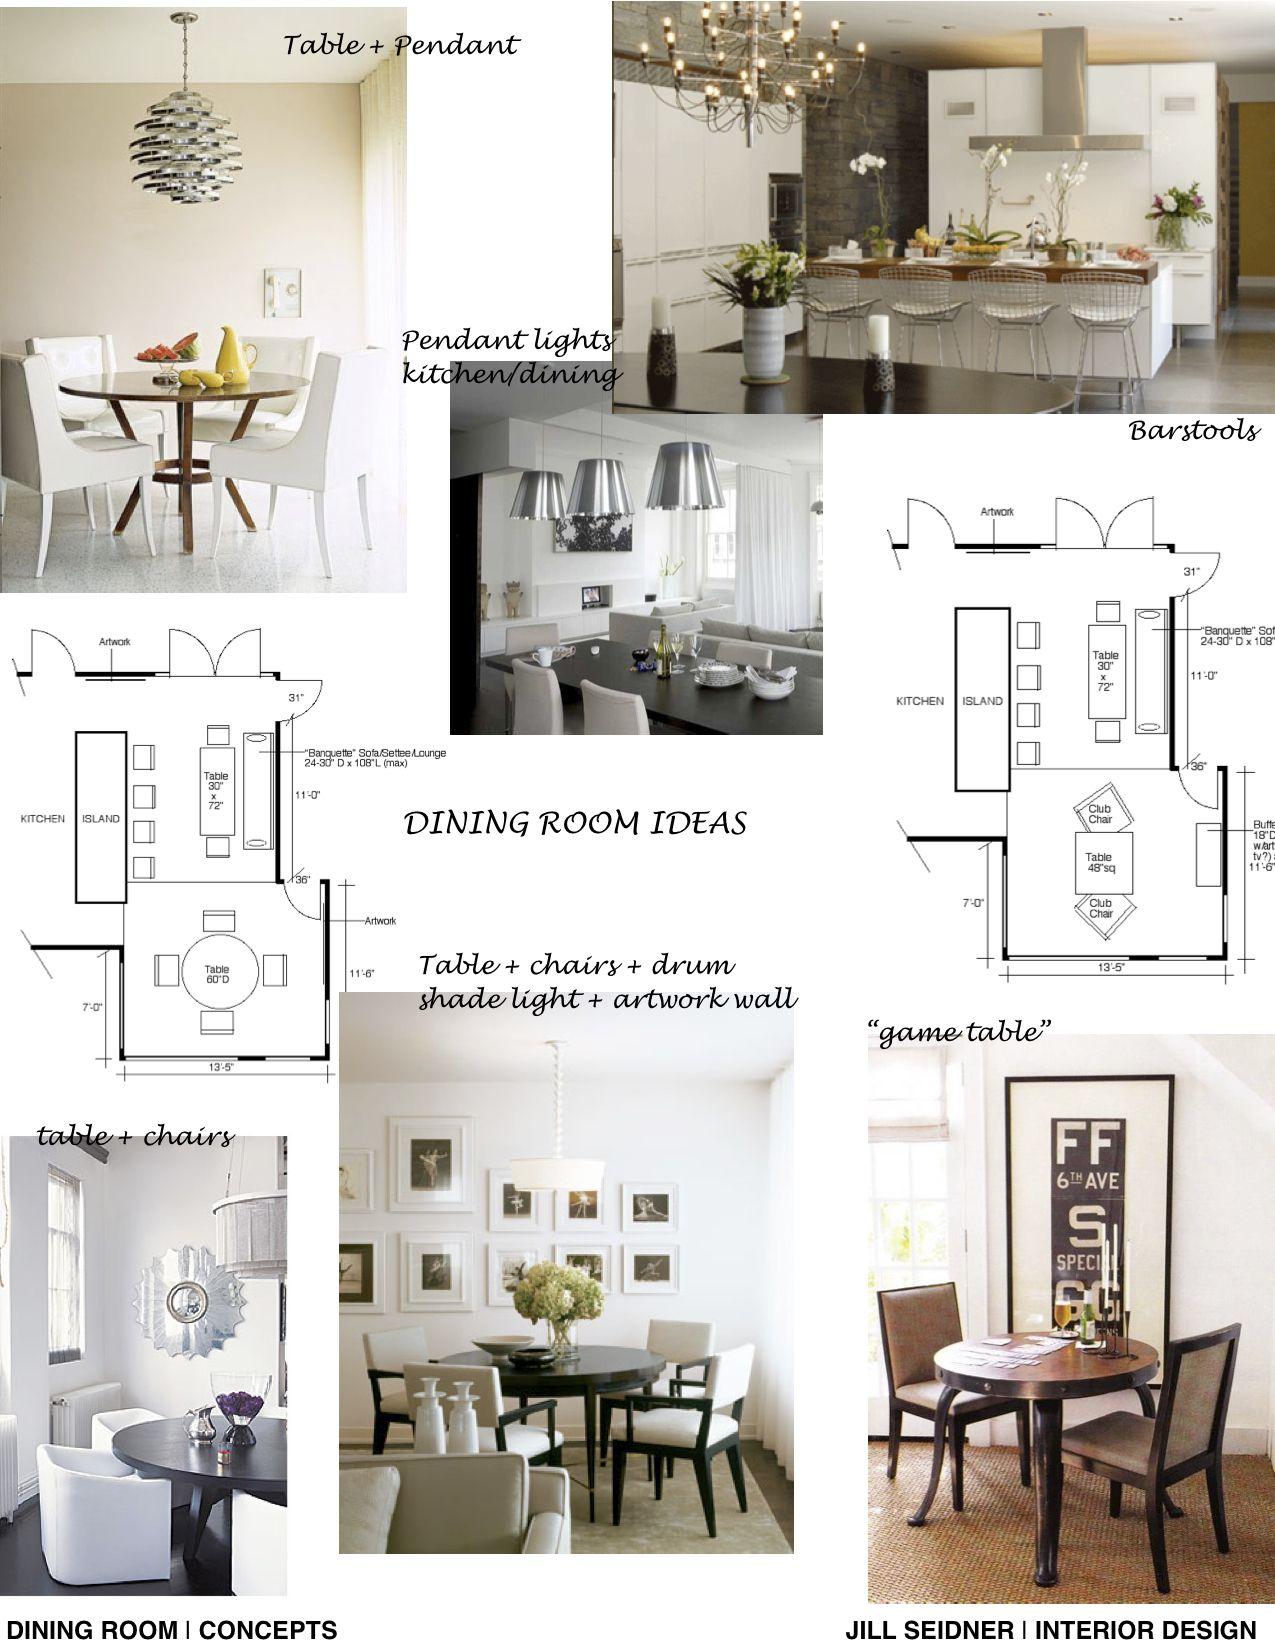 Concept Board For A Kitchen Dining Area Interior Design